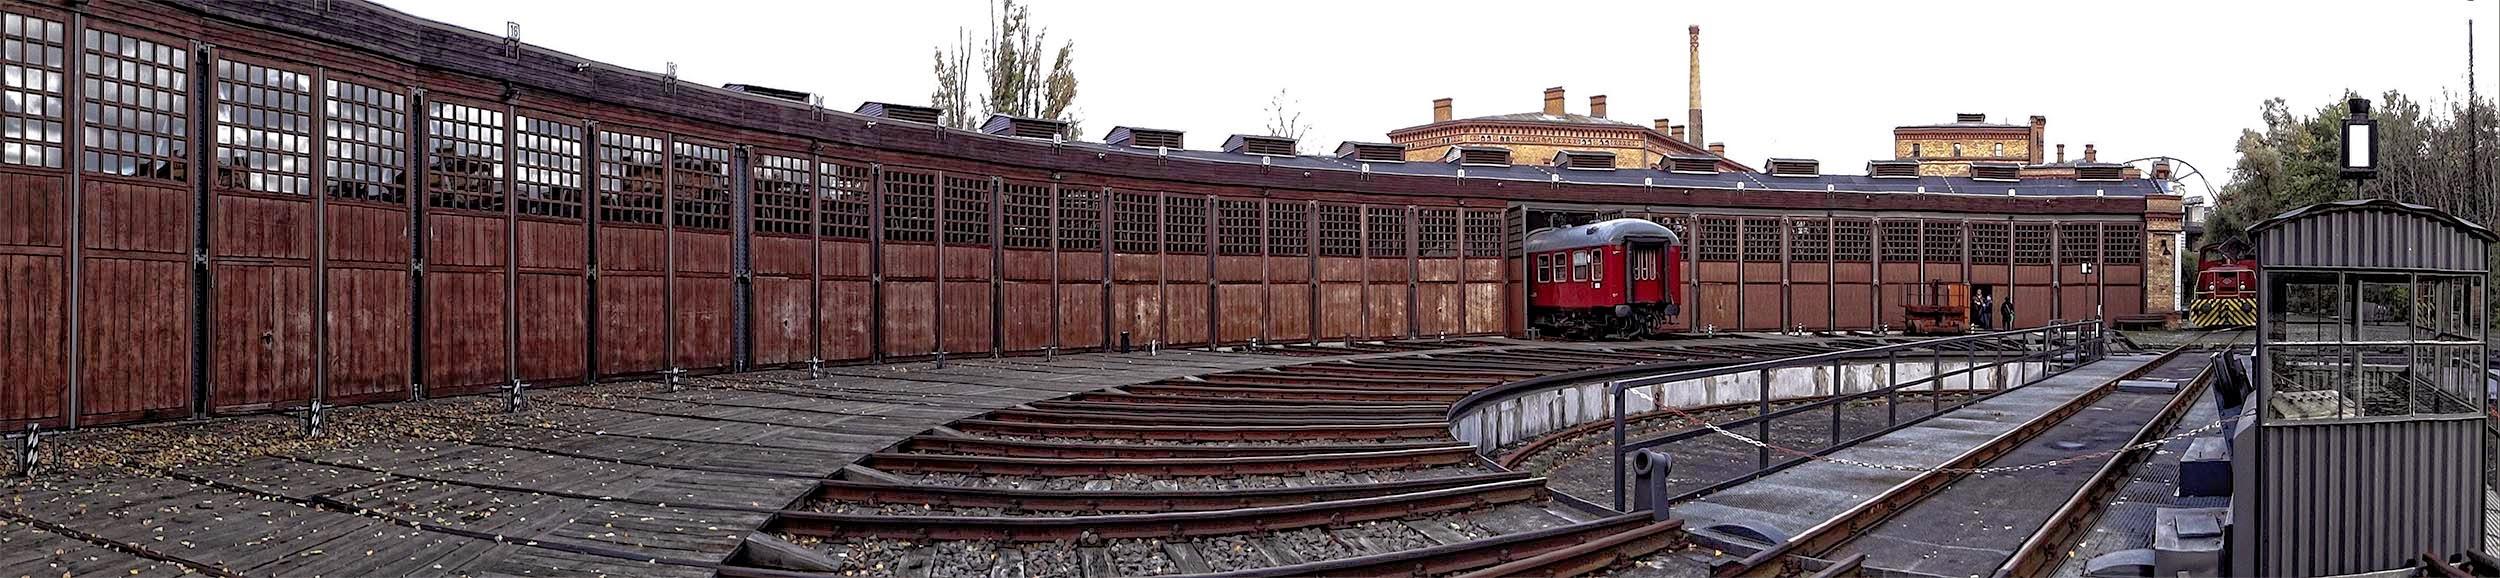 Lockschuppen Technik Museum